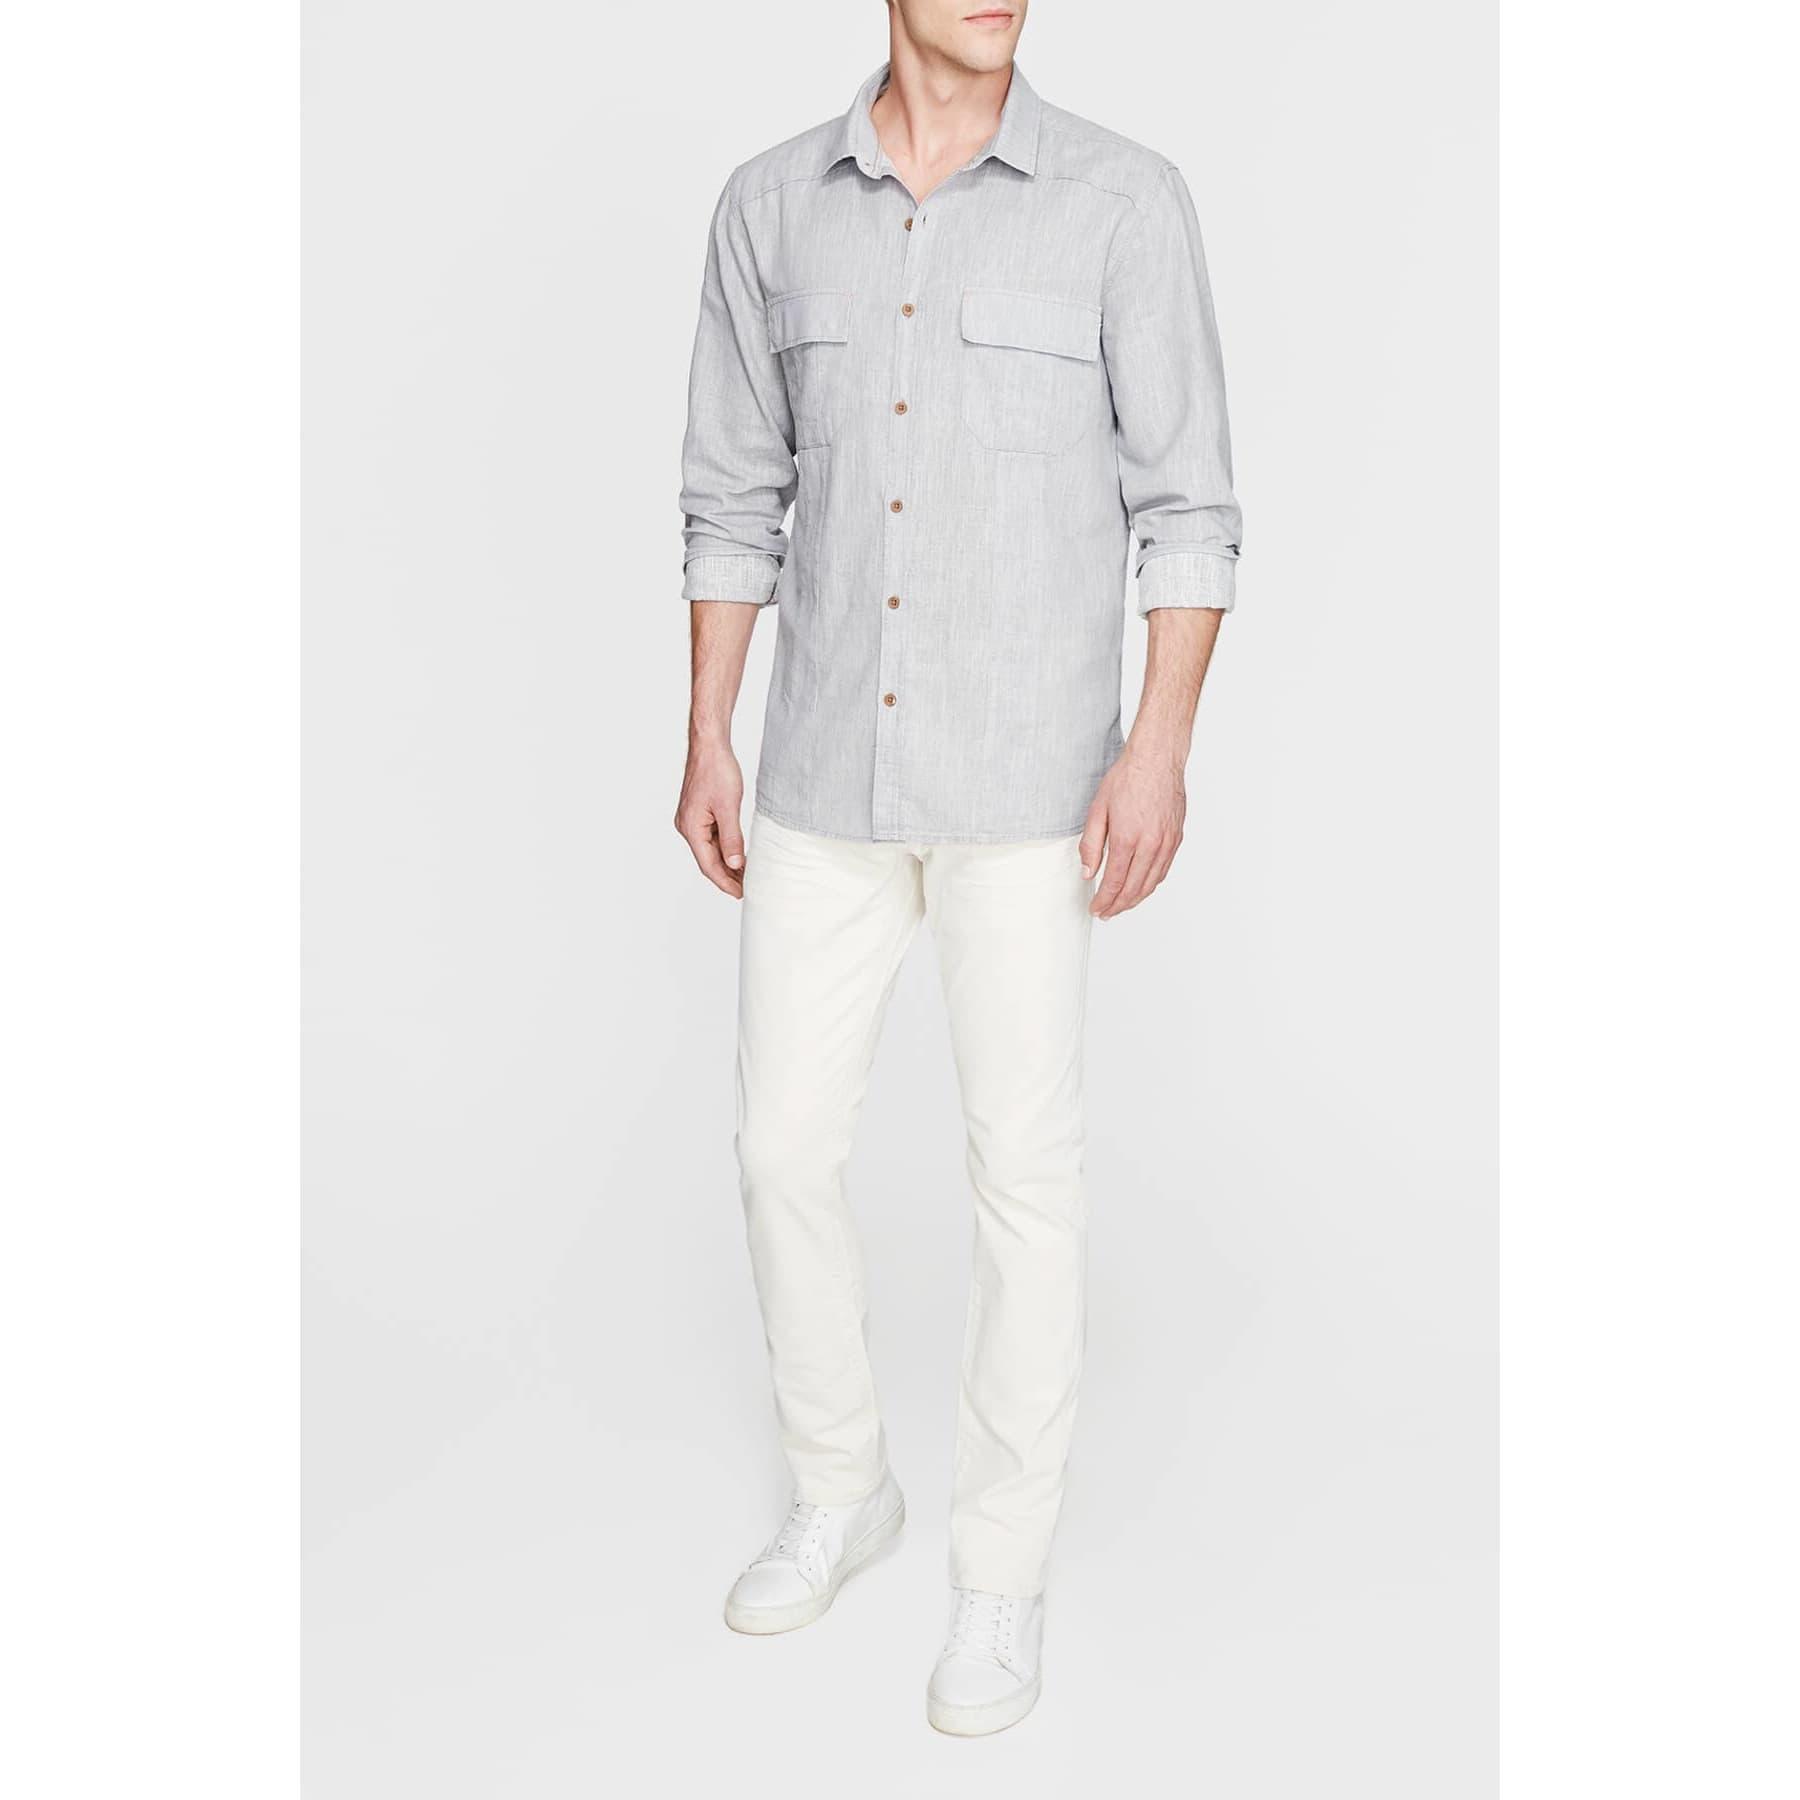 Mavi Jeans Erkek Çift Cepli Kimyon Gömlek